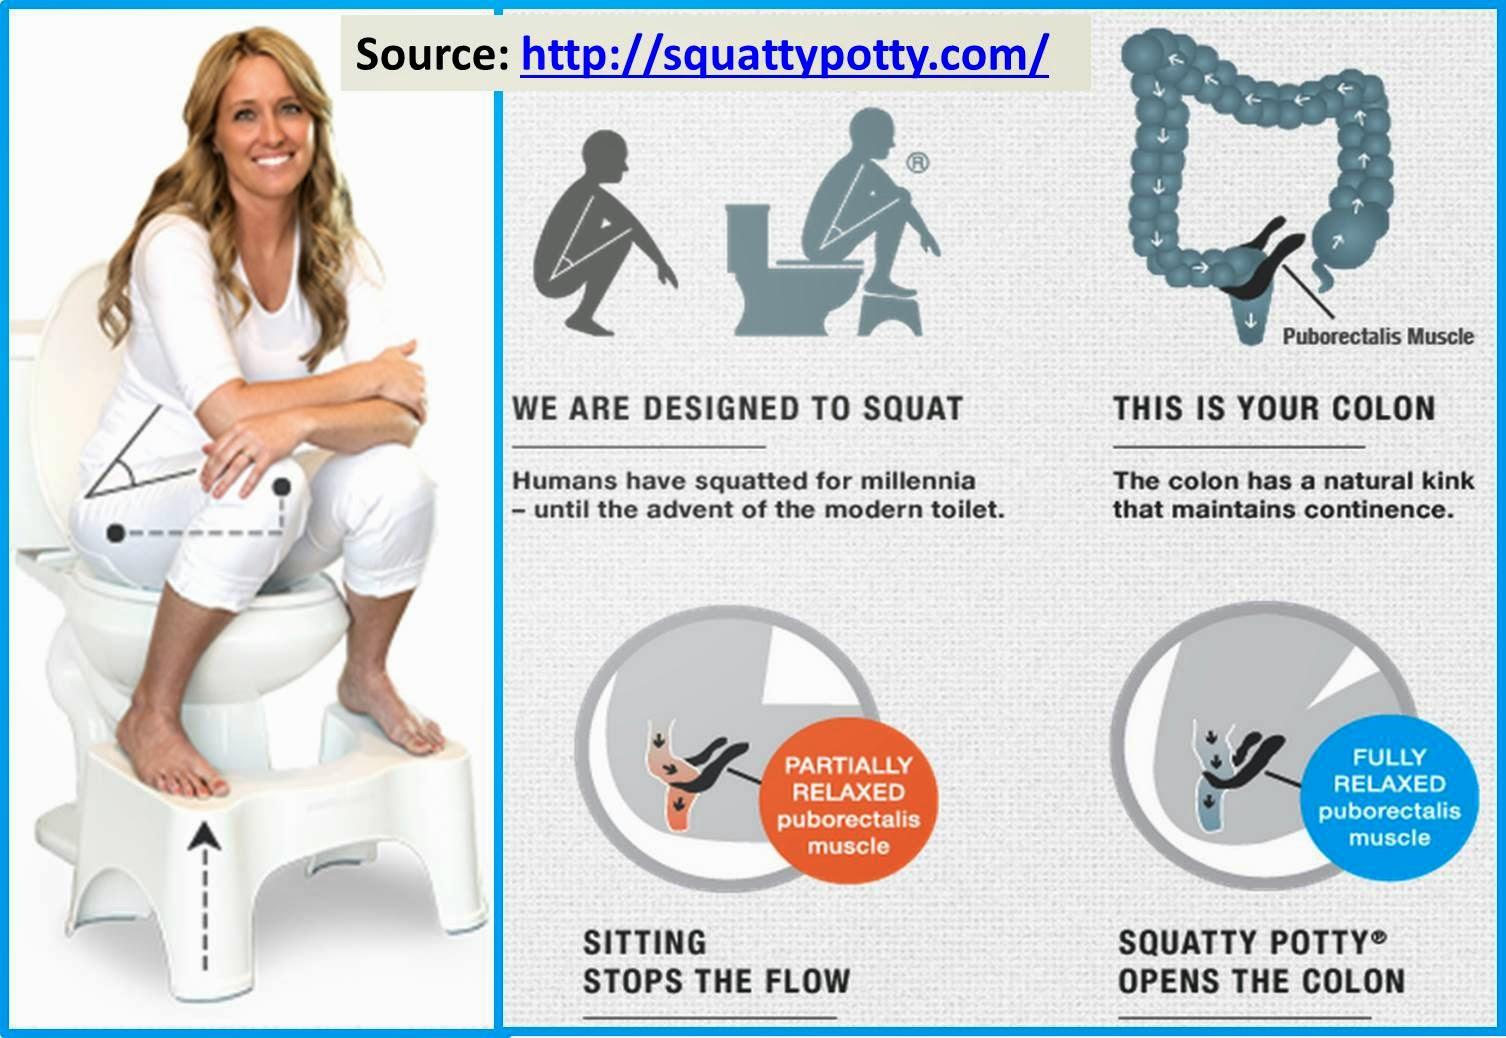 SquattyPotty